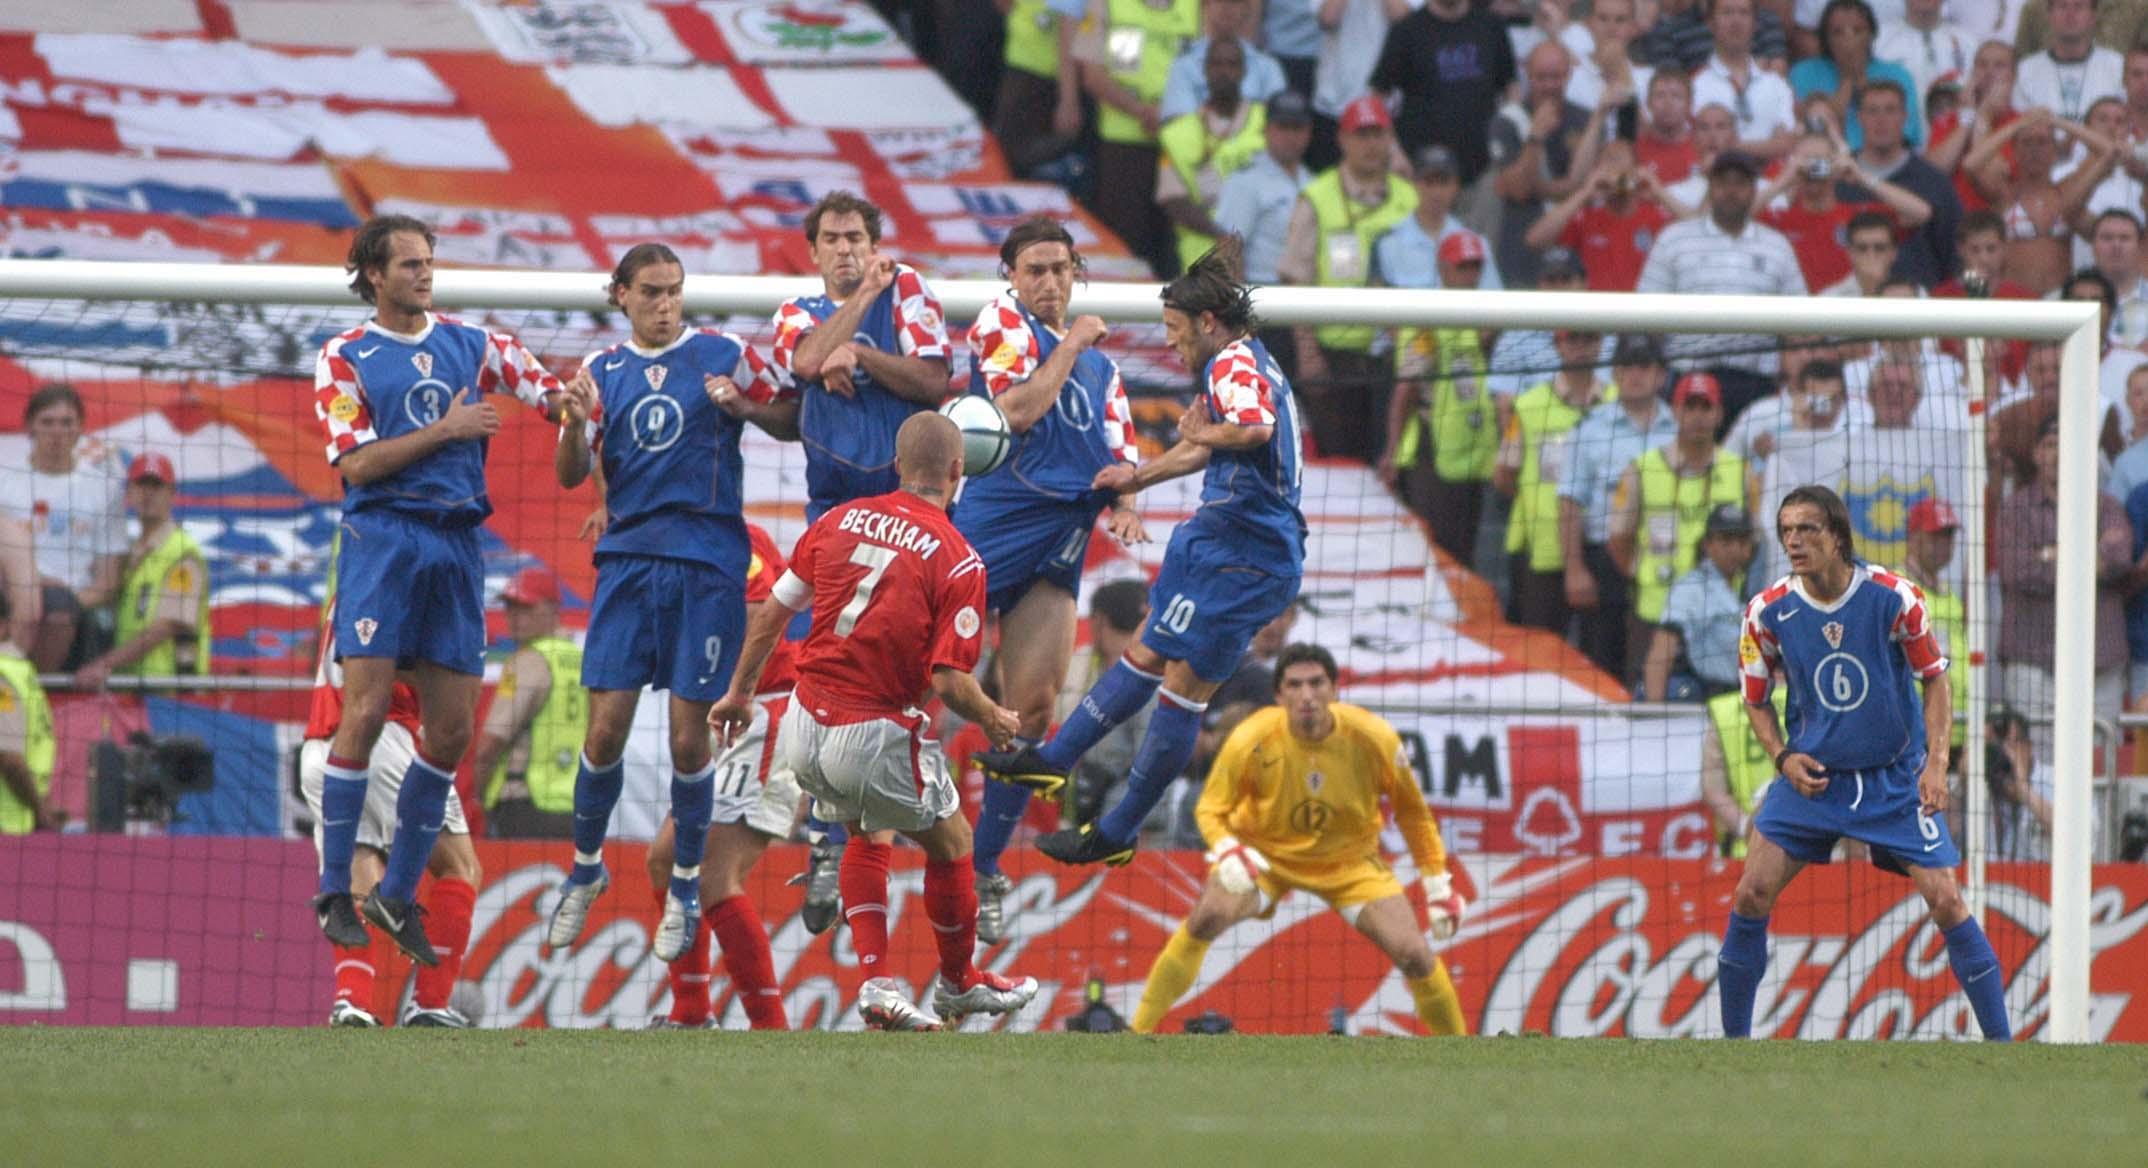 Portugal Hrvatska - Engleska  2 : 4  simunic,  prso,  tudor,  sokota,  kovac, butina , zivkovic,  FOTO=SANJIN_STRUKIC